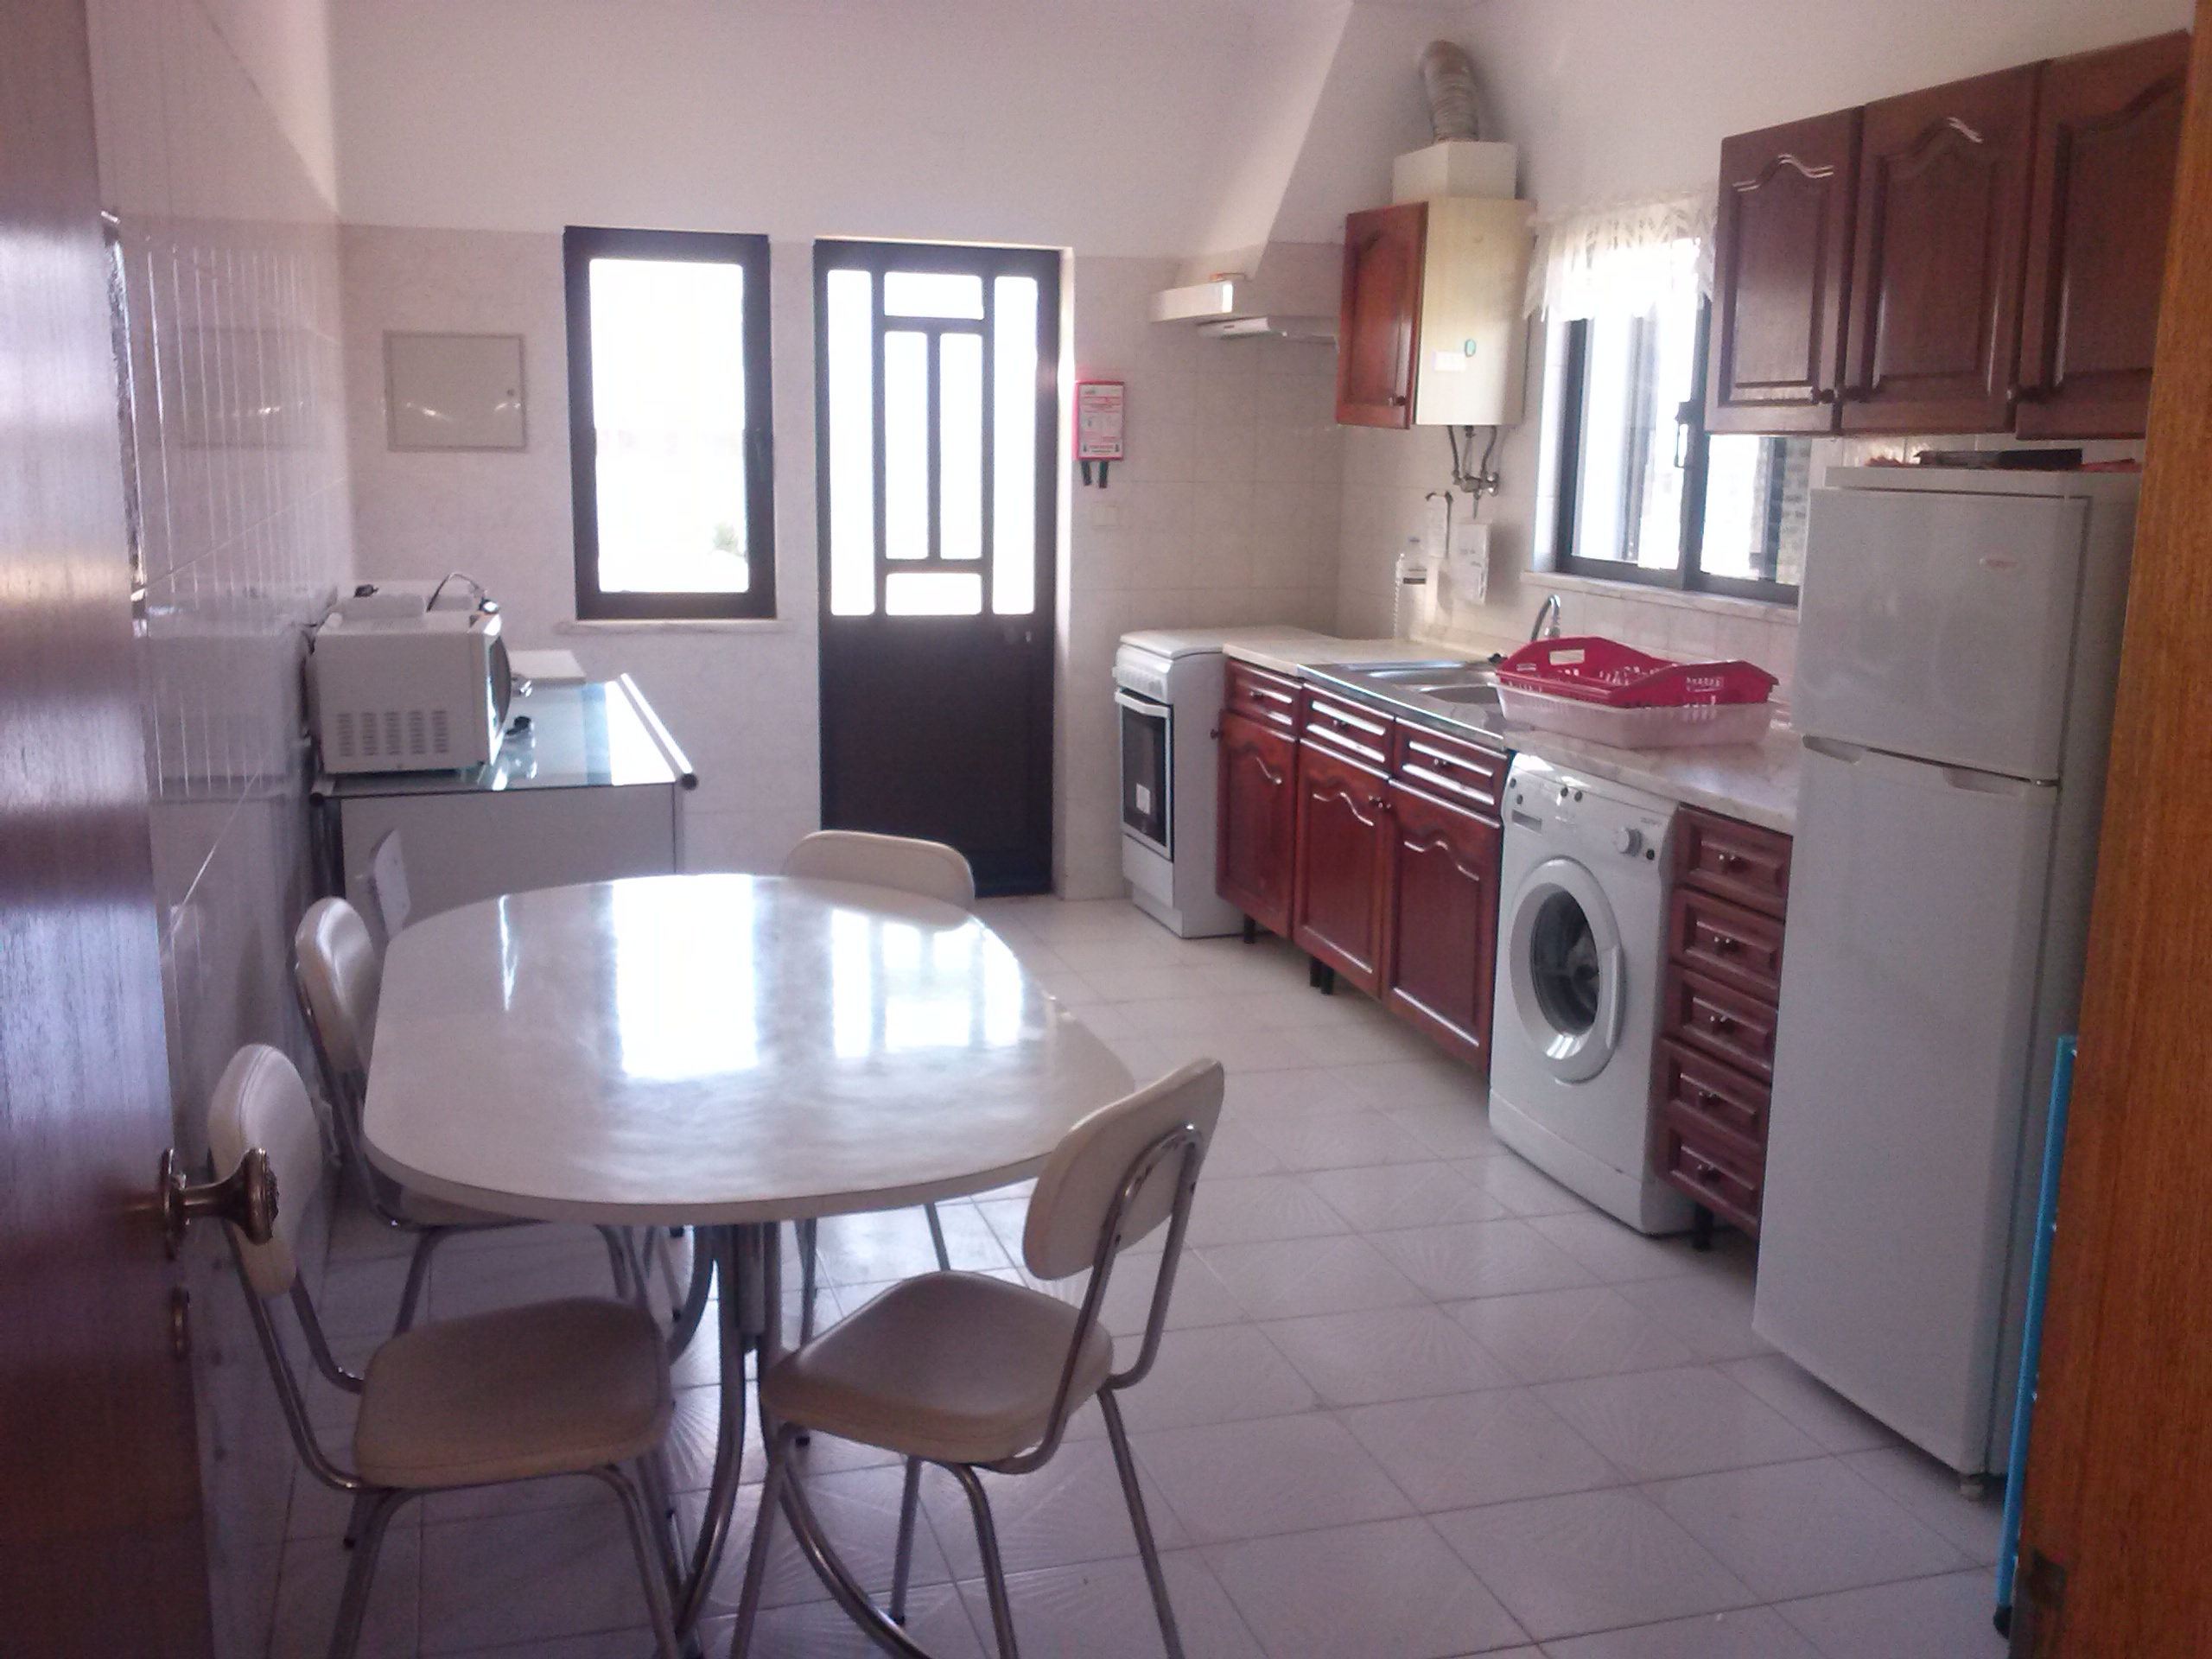 Holiday apartments and villas for rent, Cosy Villa near the best beaches on the Algarve West Coast in Urbanização Vale da Telha Aljezur, Portugal Algarve, REF_IMG_8514_8540